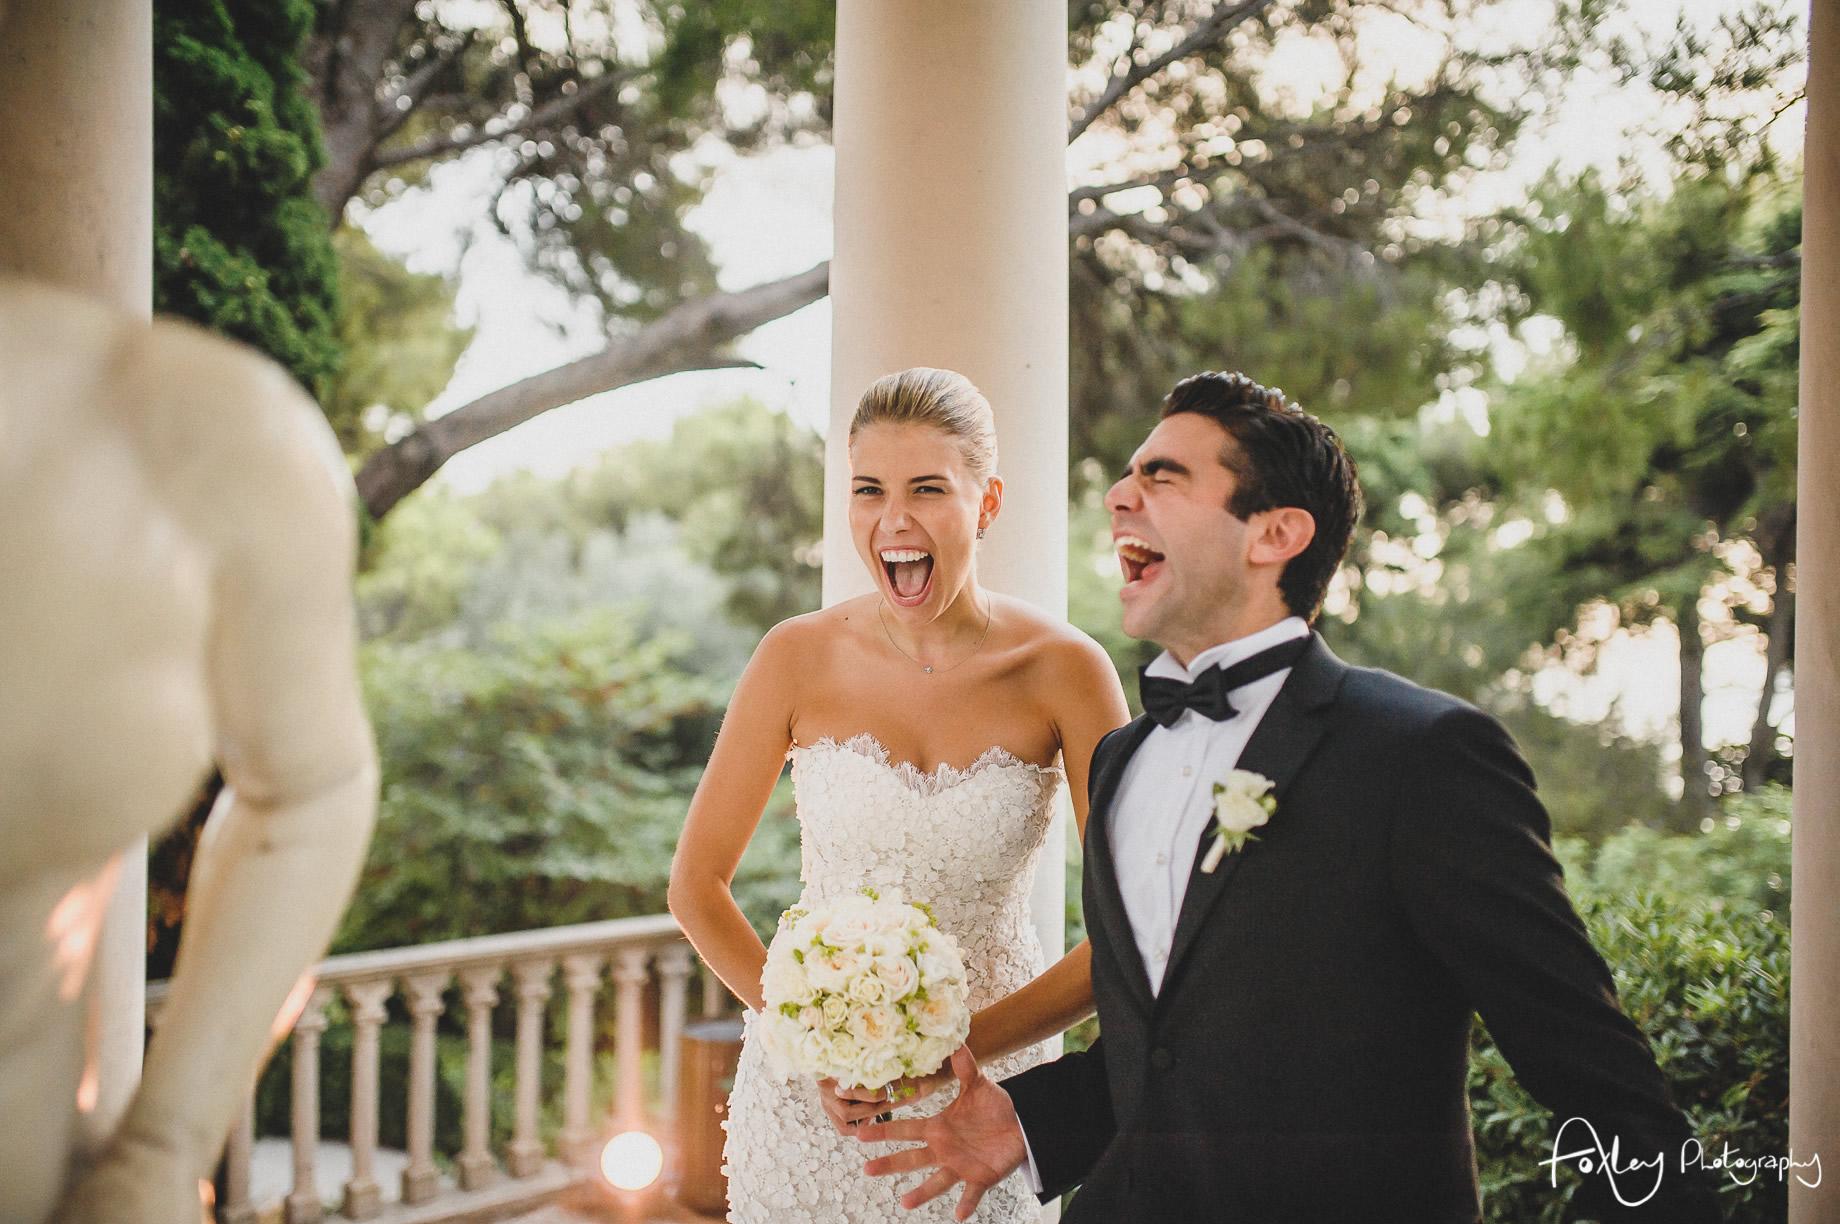 Jil and Will's Wedding at Villa Ephrussi De Rothschild 142